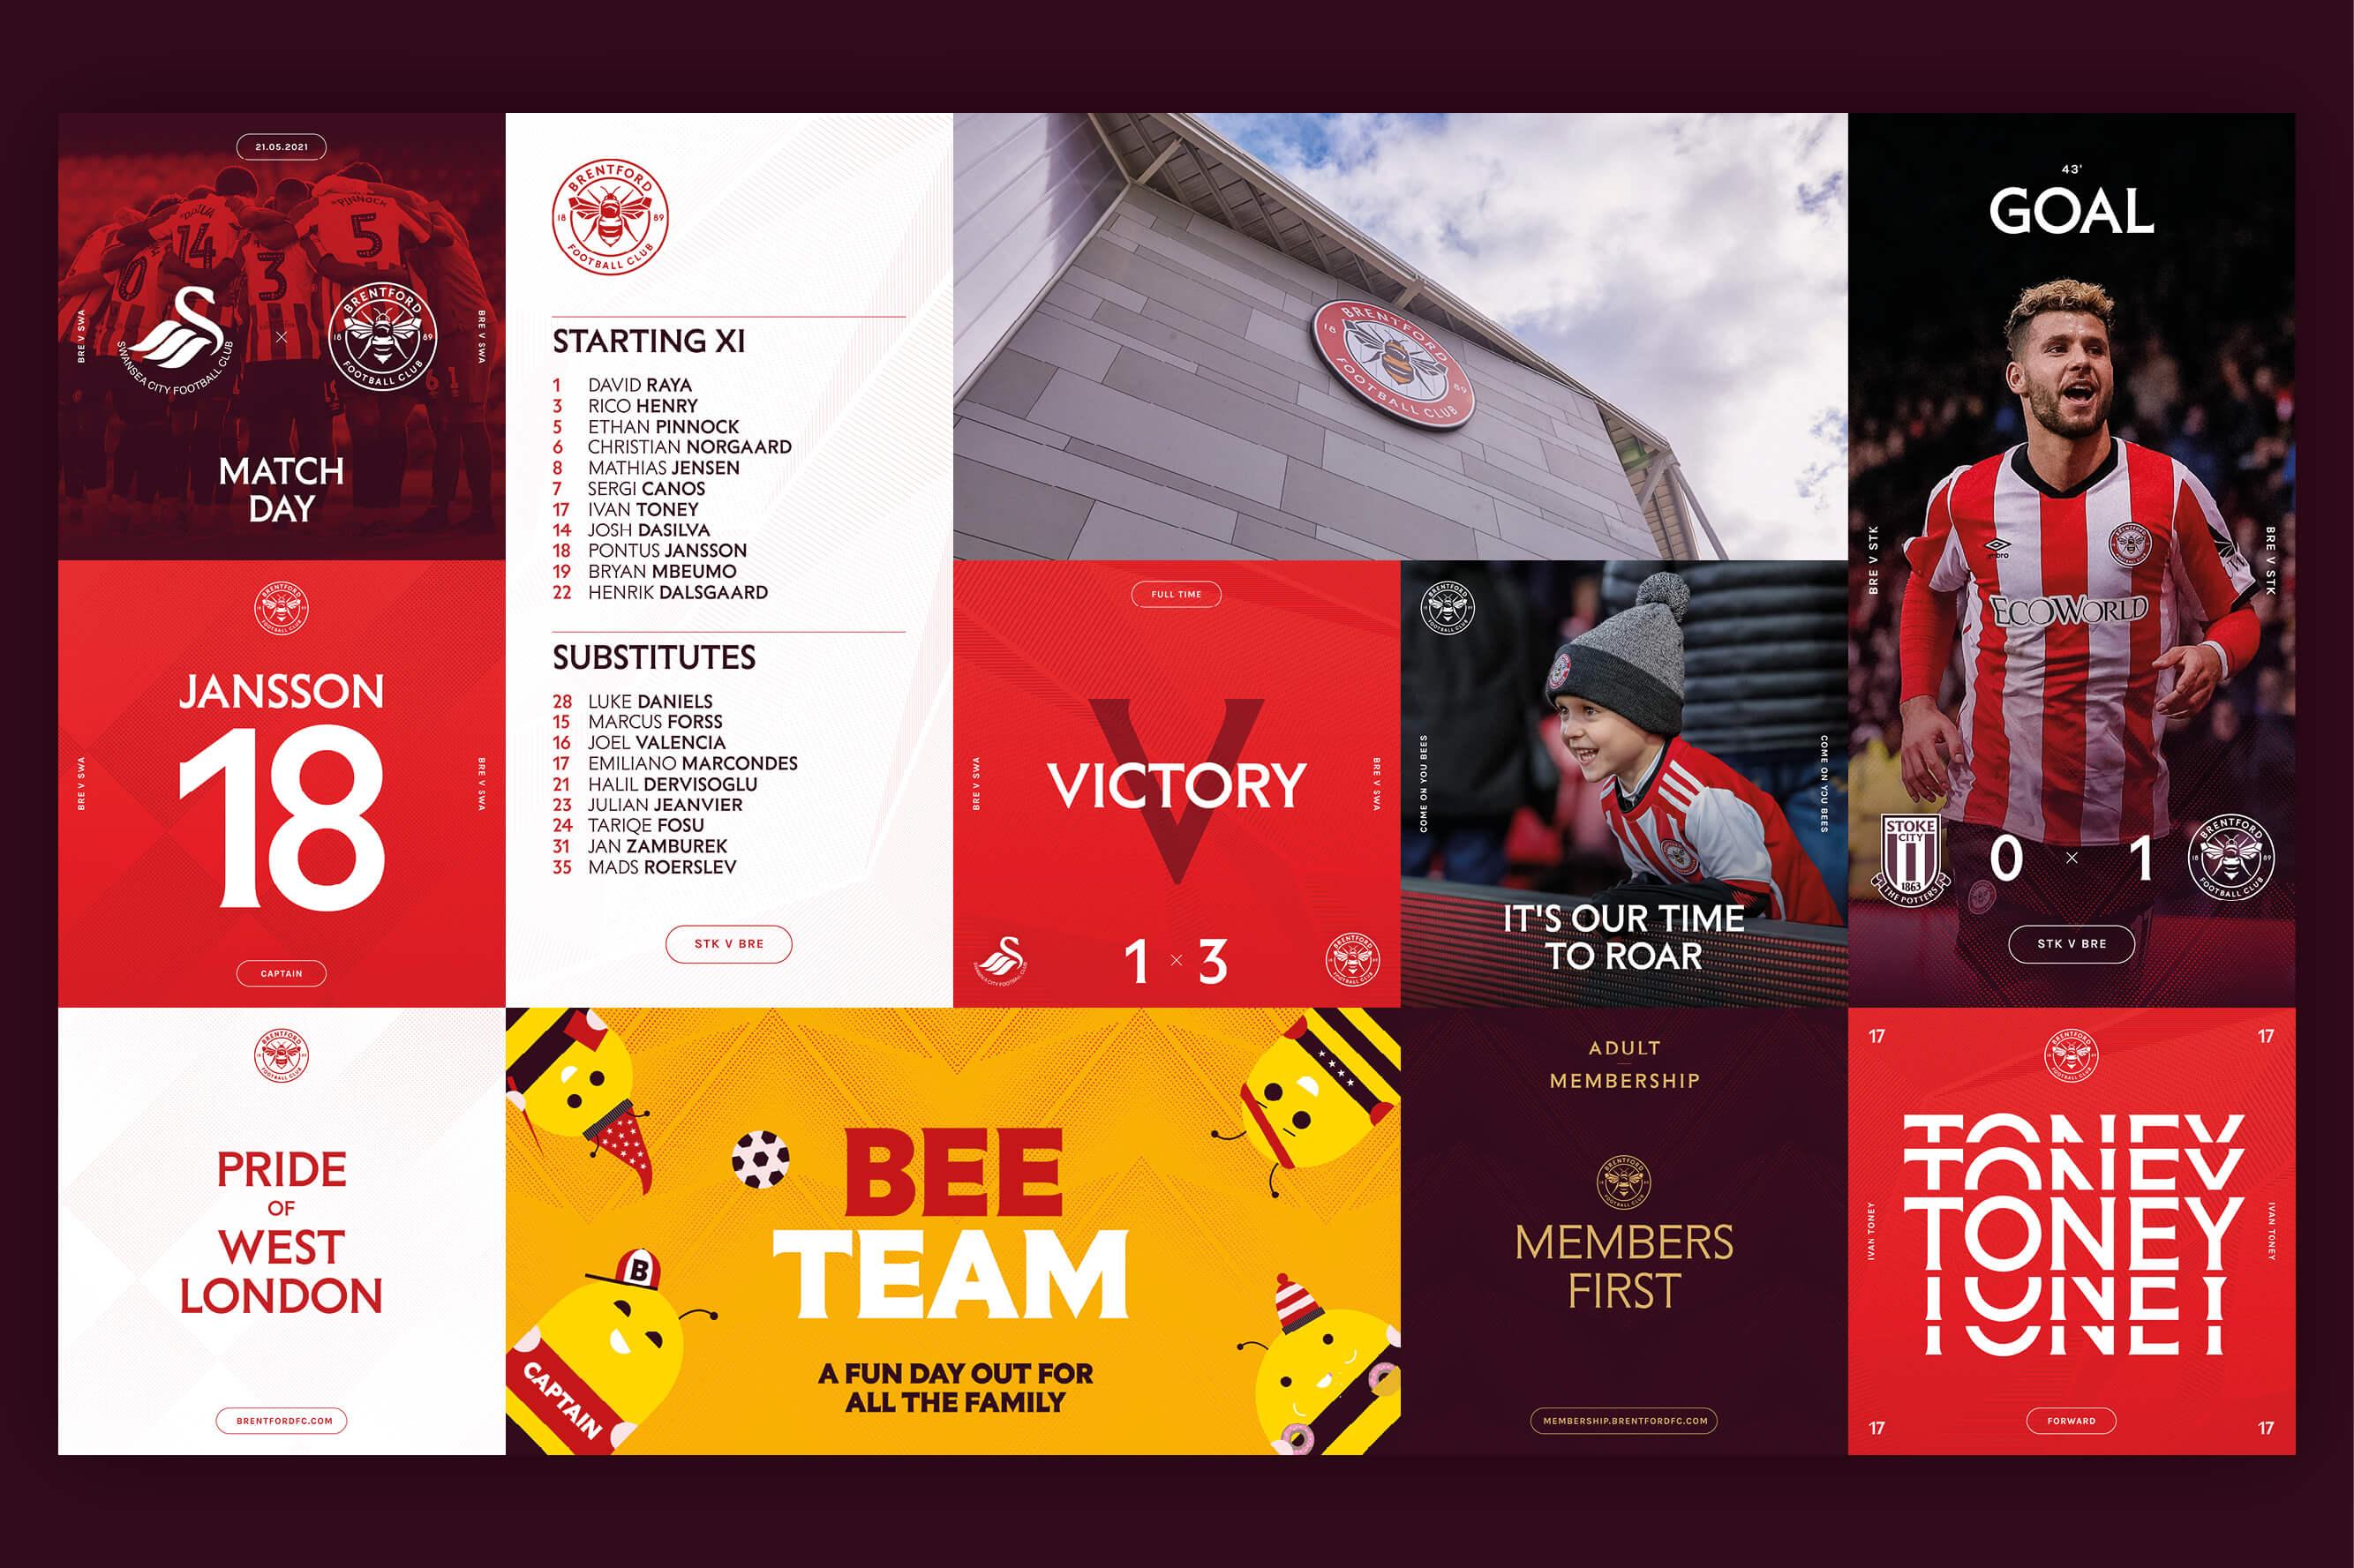 Thisaway Rebrands English Championship Football Club Brentford FC